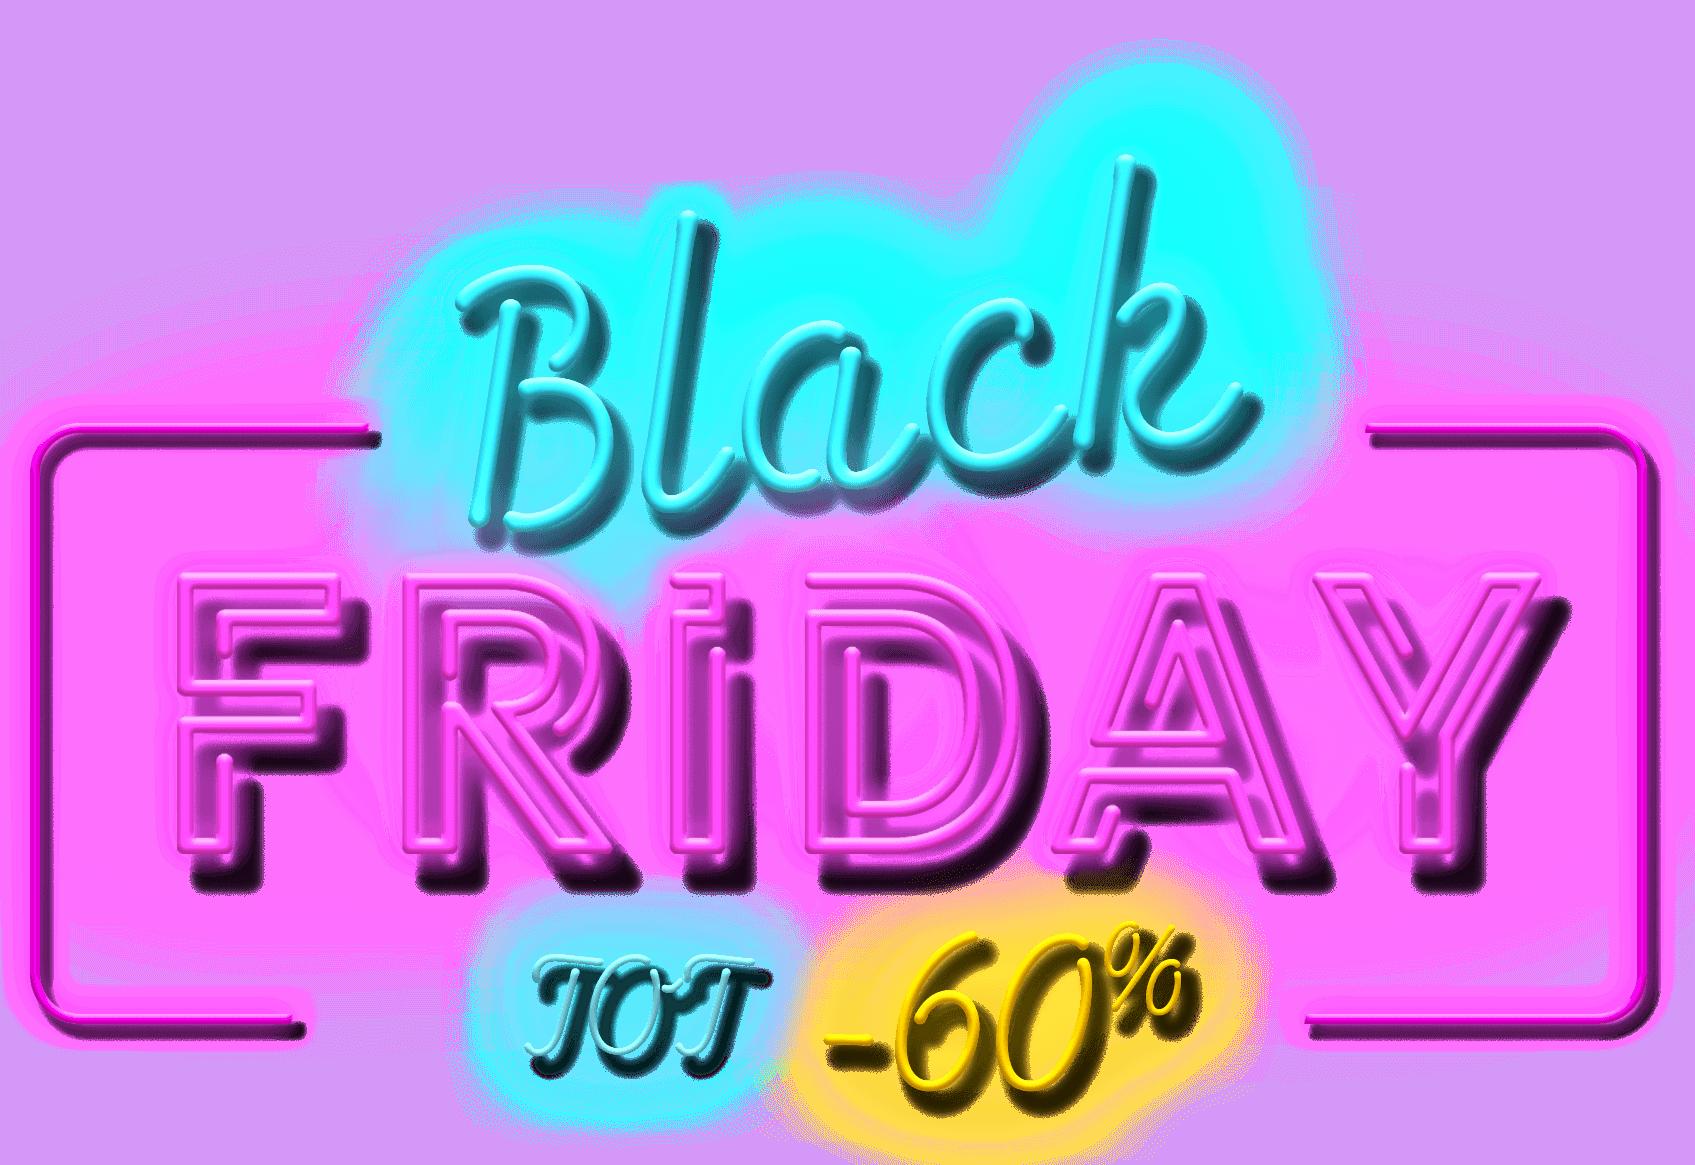 Black Friday 2018 Public Tot -60% korting